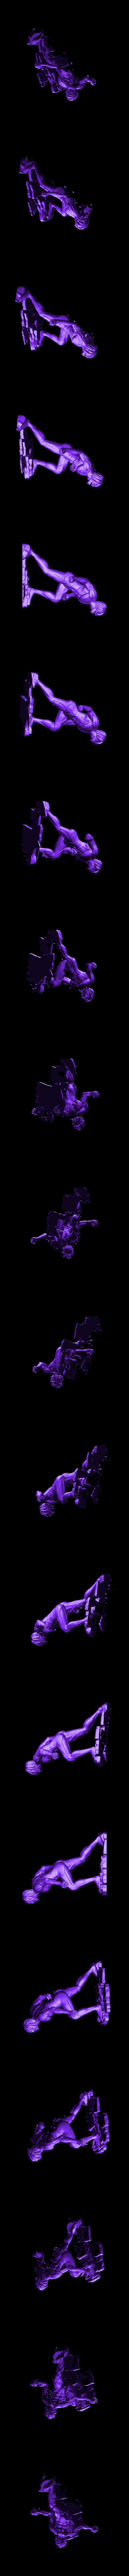 AoT_Final_Full.stl Download free STL file Eren - Attack on Titan • 3D print model, mag-net